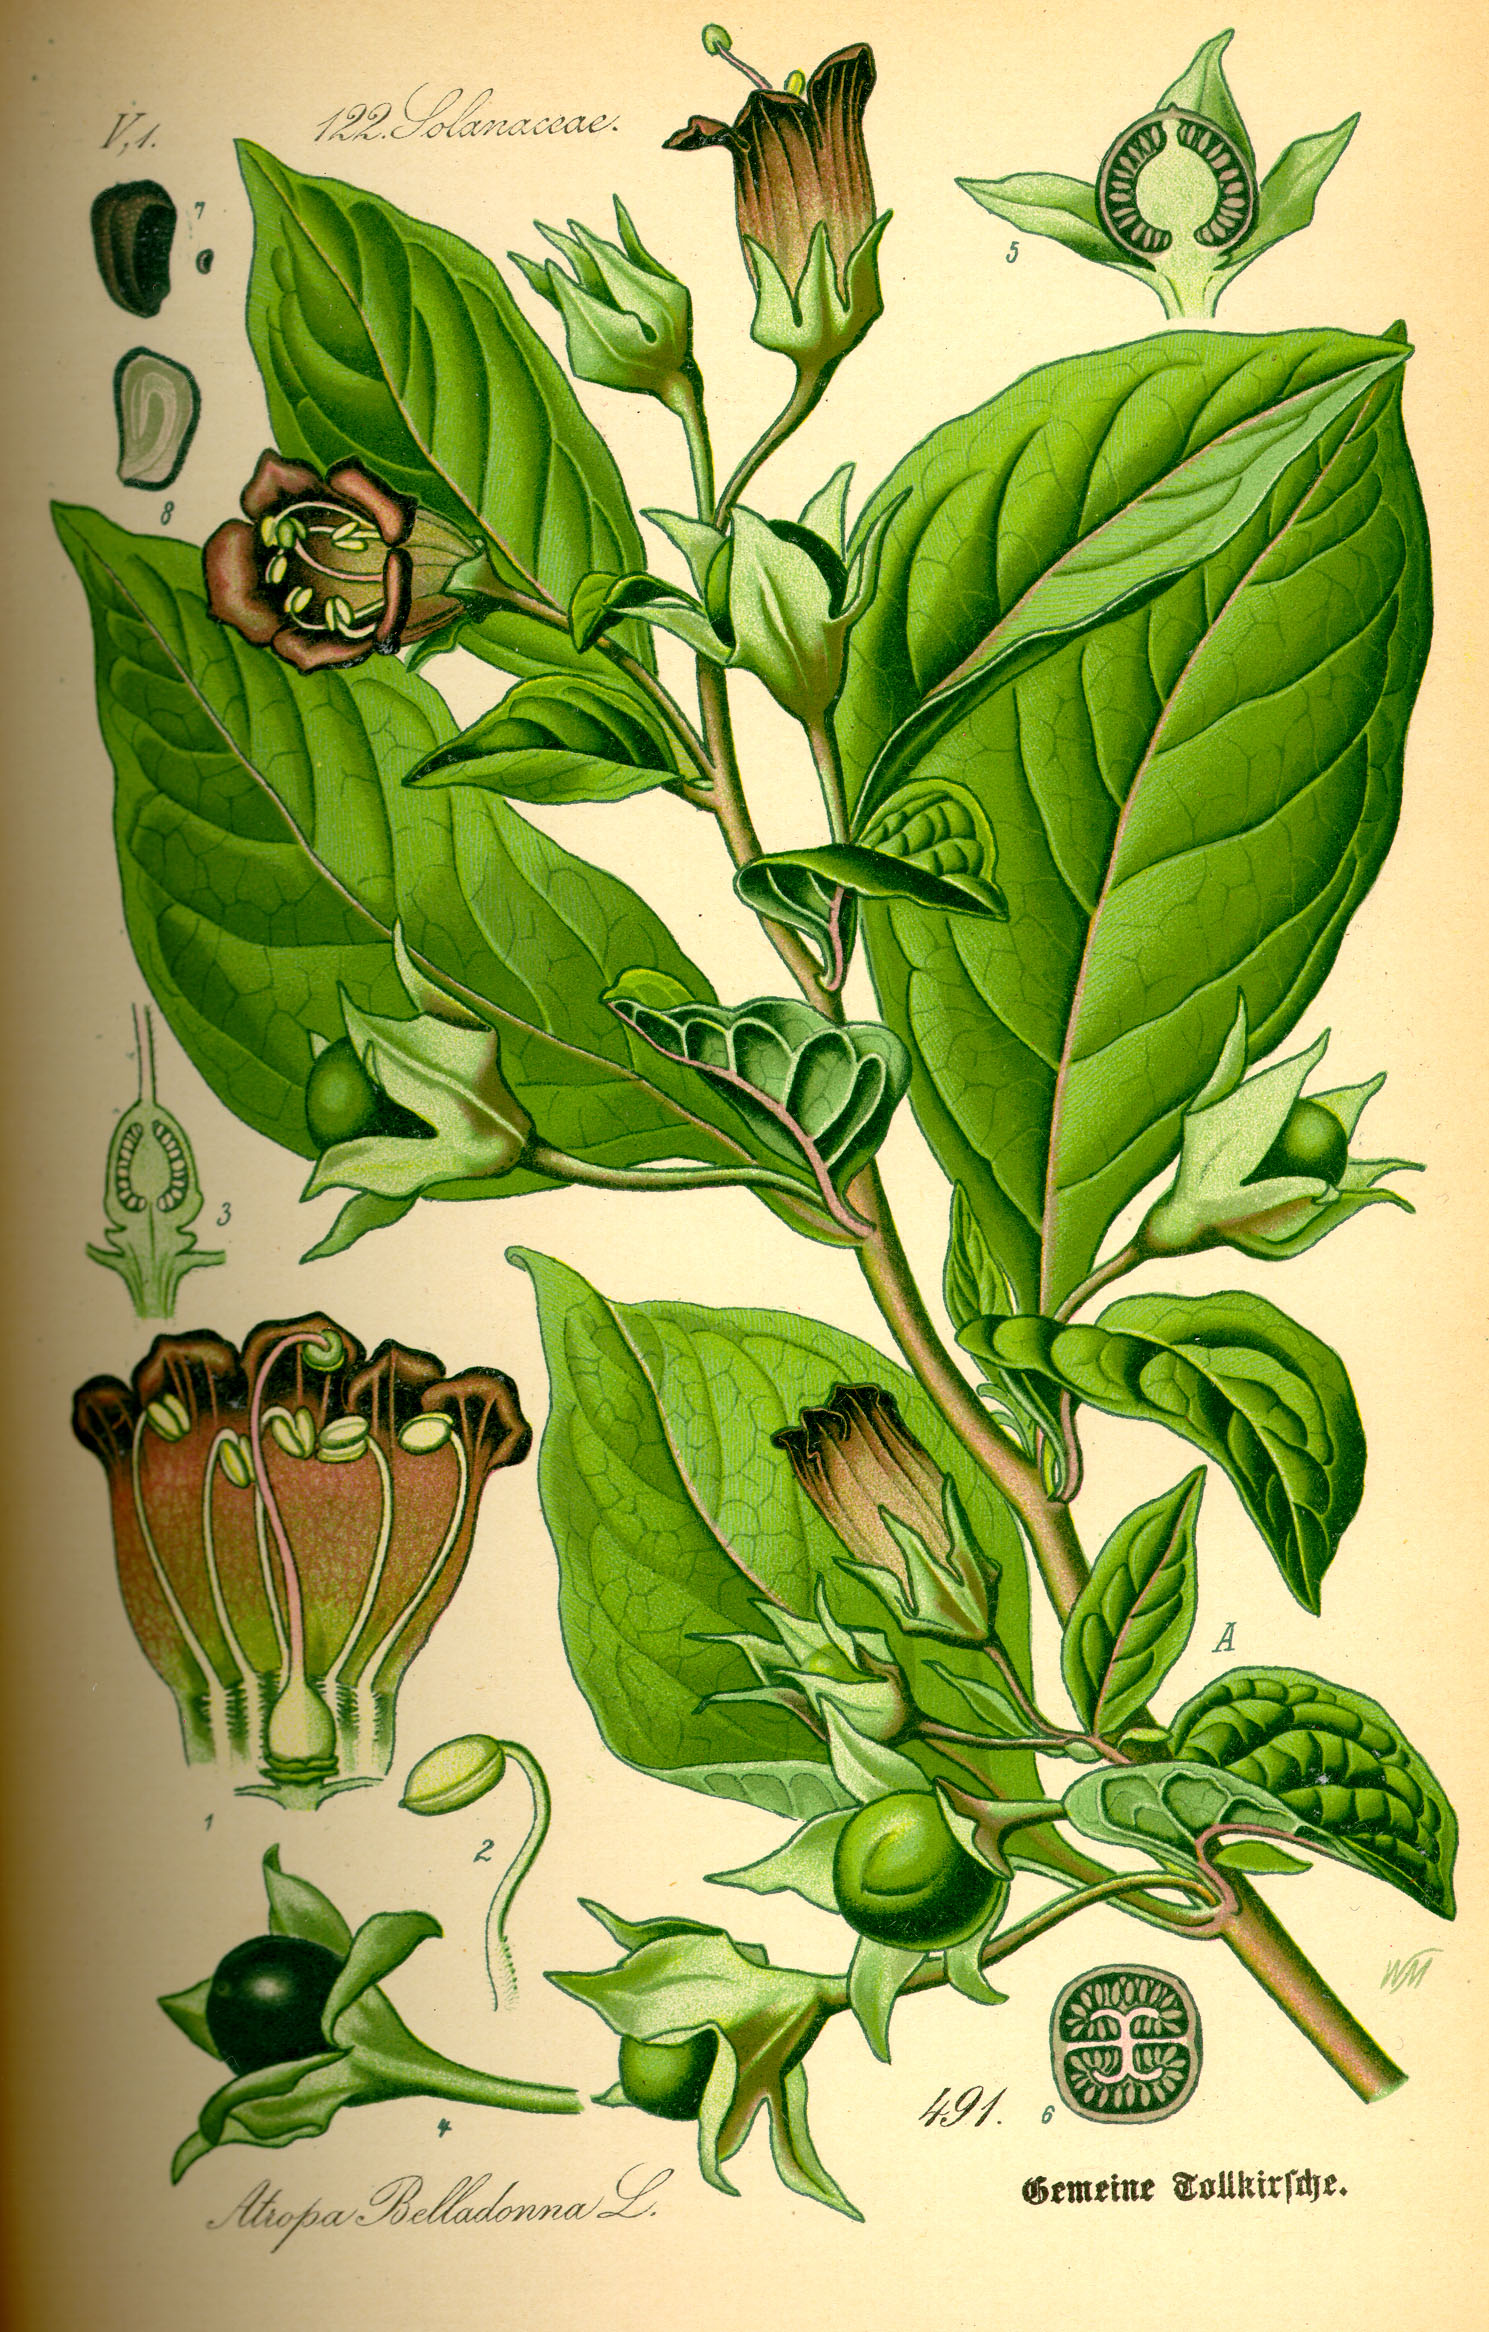 Atropa belladonna (Solanaceae). Erboristeria Dulcamara. www.gfmer.ch